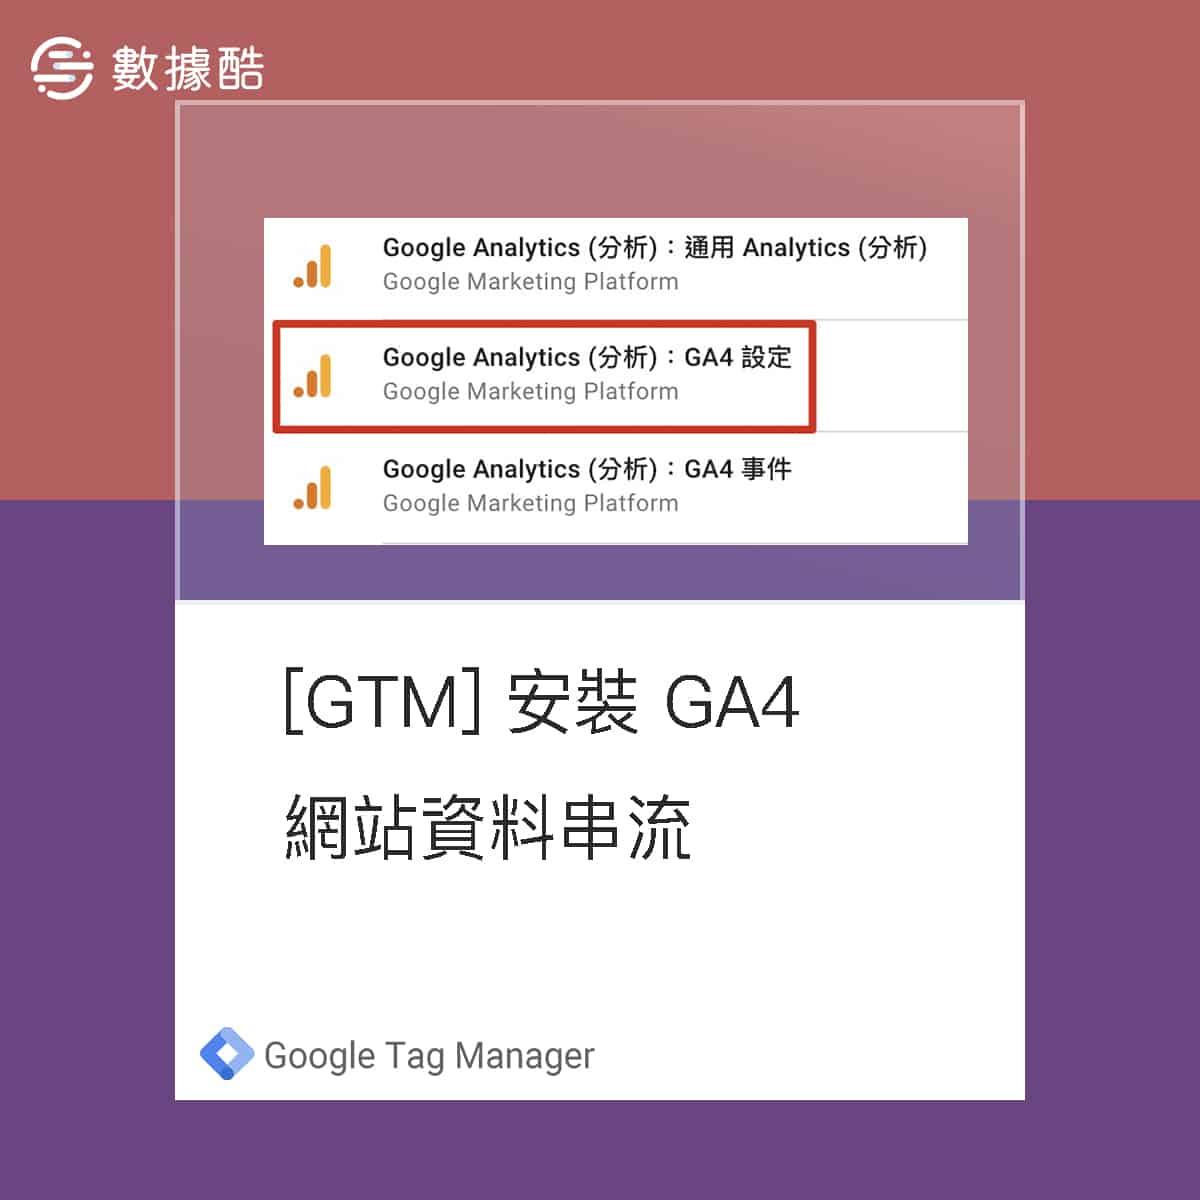 Google Tag Manager 安裝 Google Analytics 4 網站資料串流